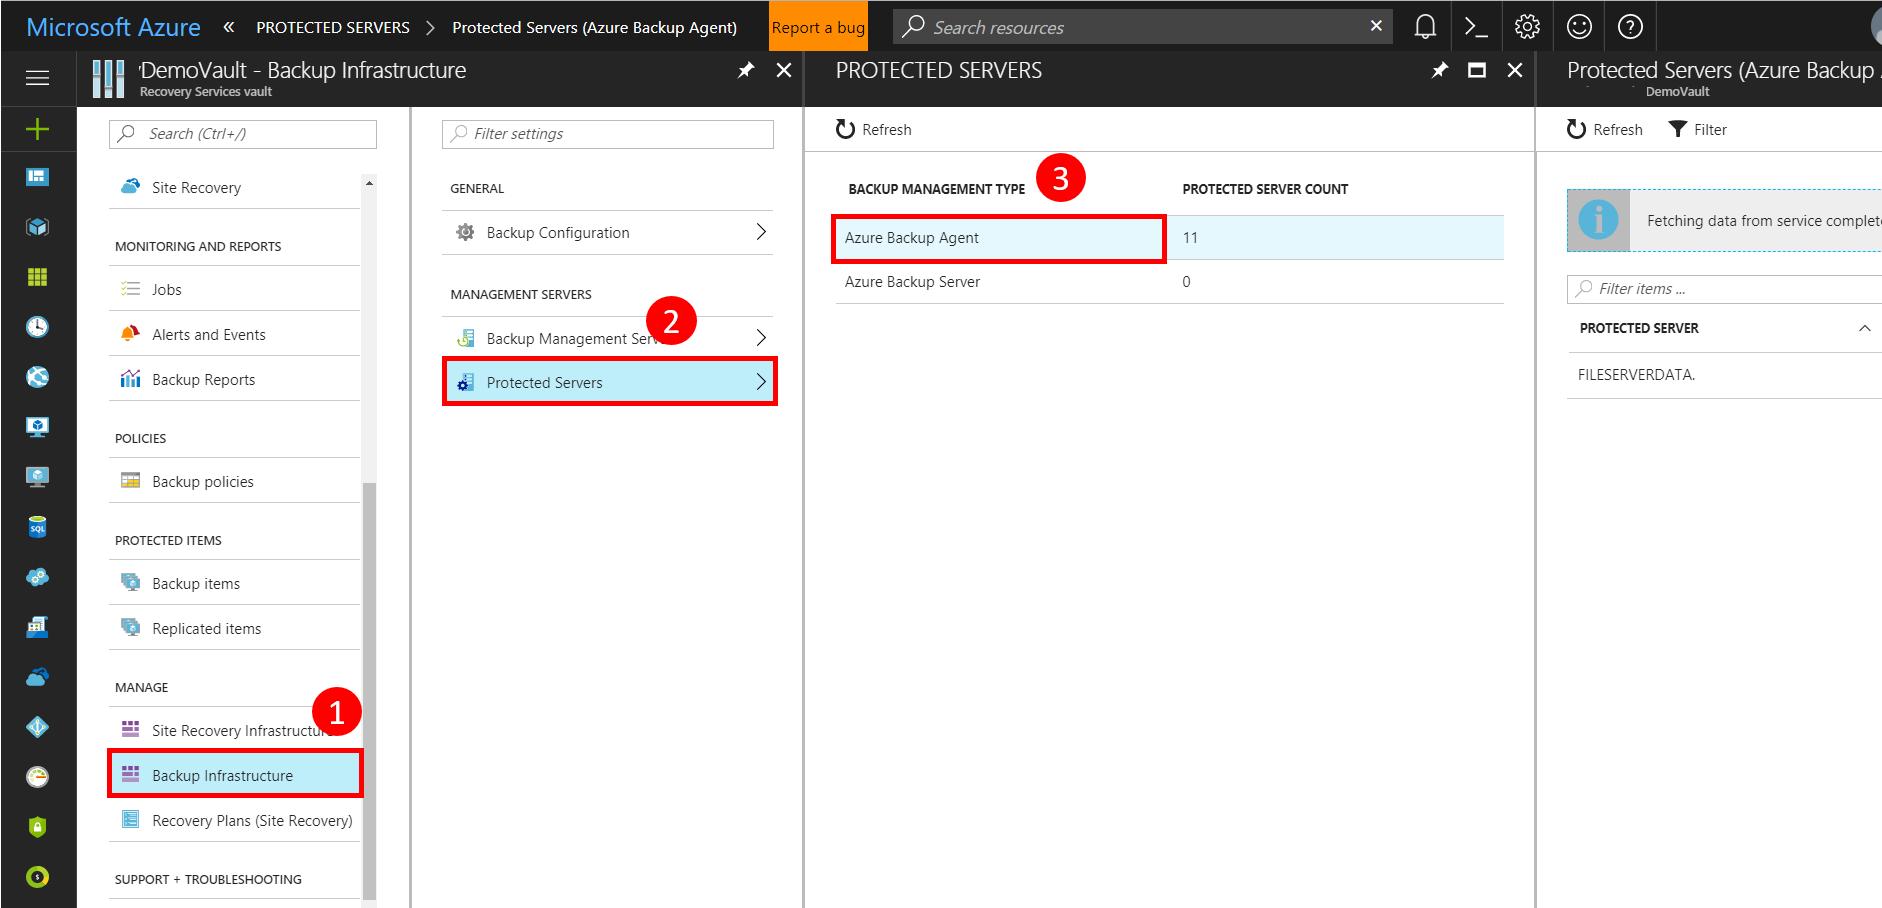 Select Backup Management Type